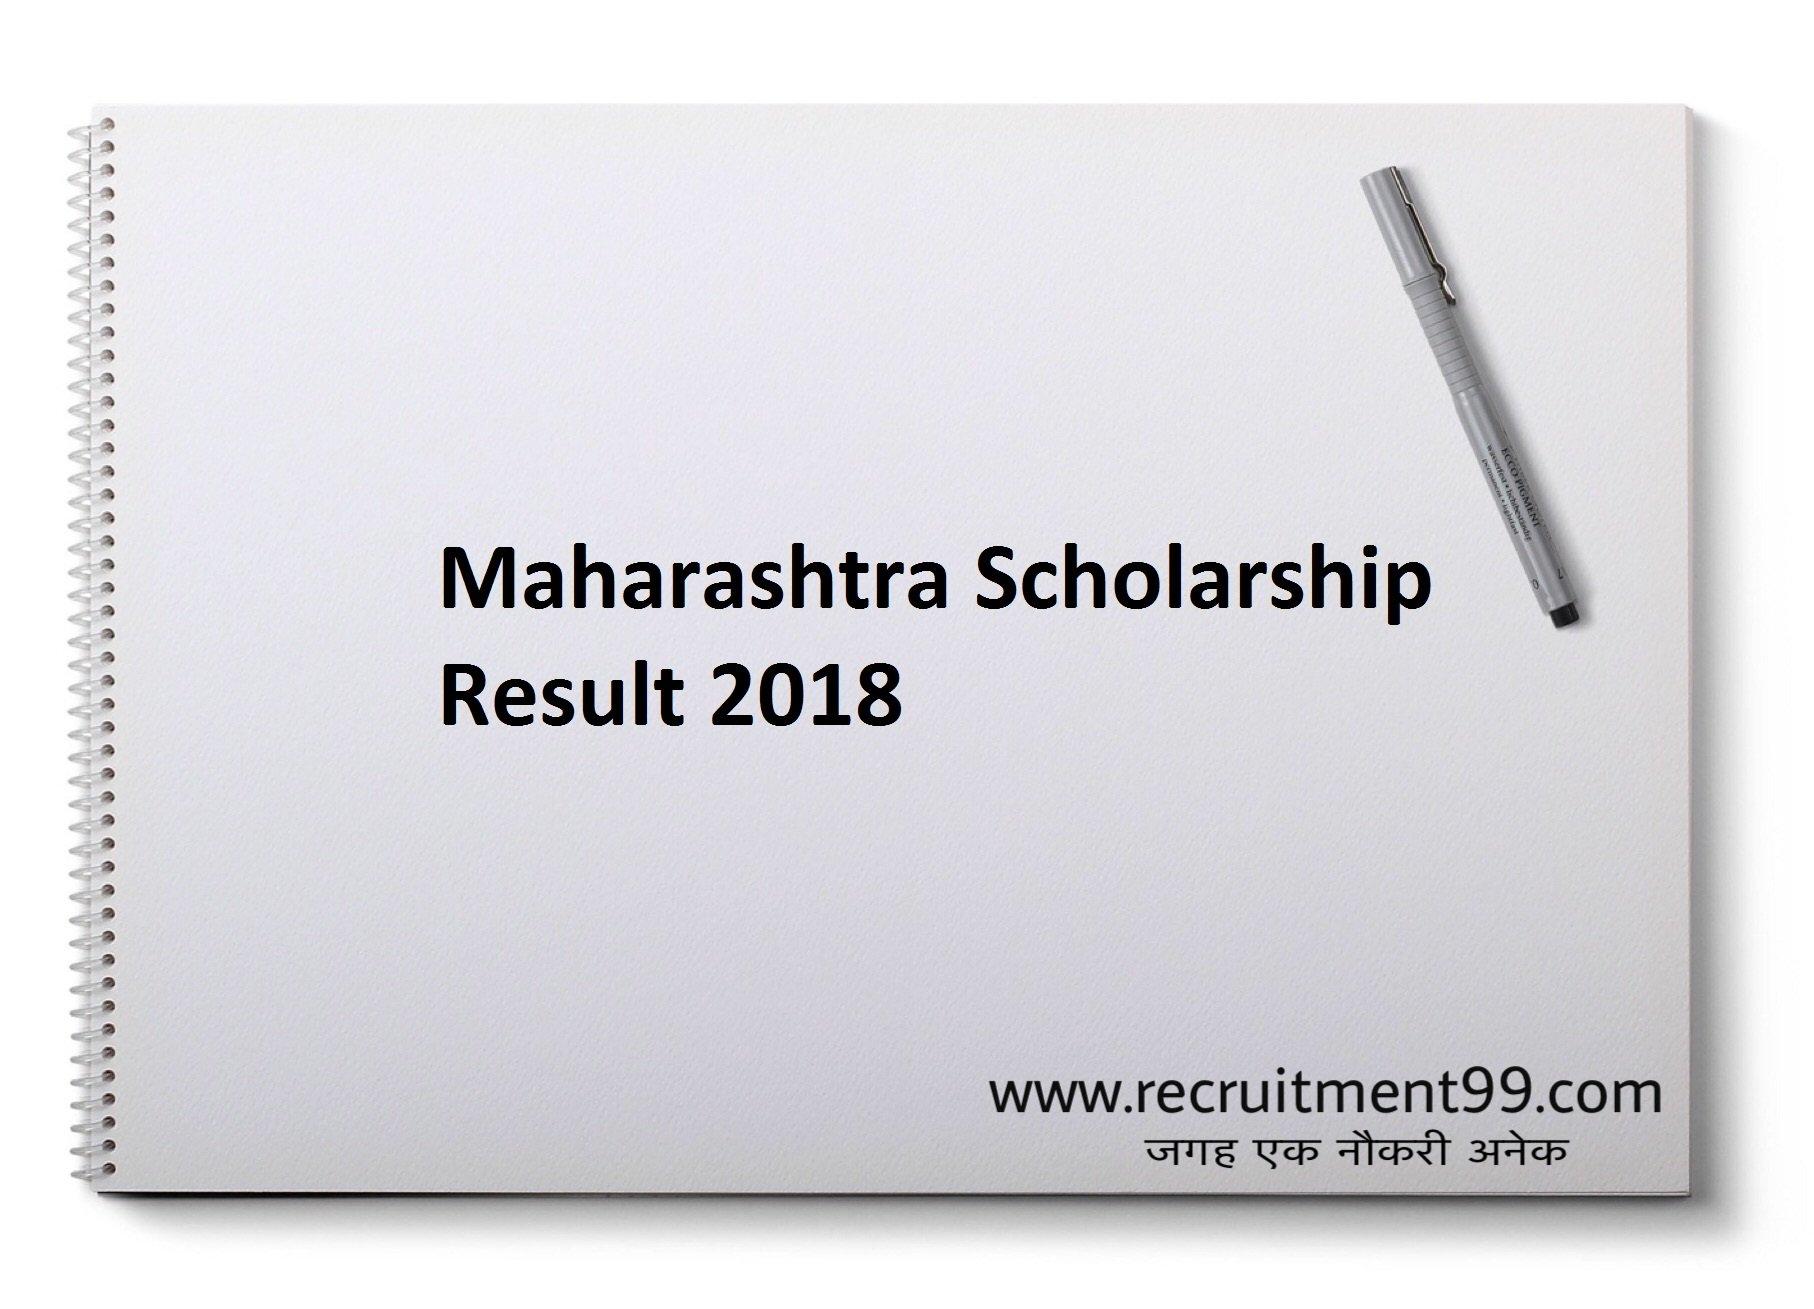 Maharashtra Scholarship 5th 8th Class Cut off Merit List 2019